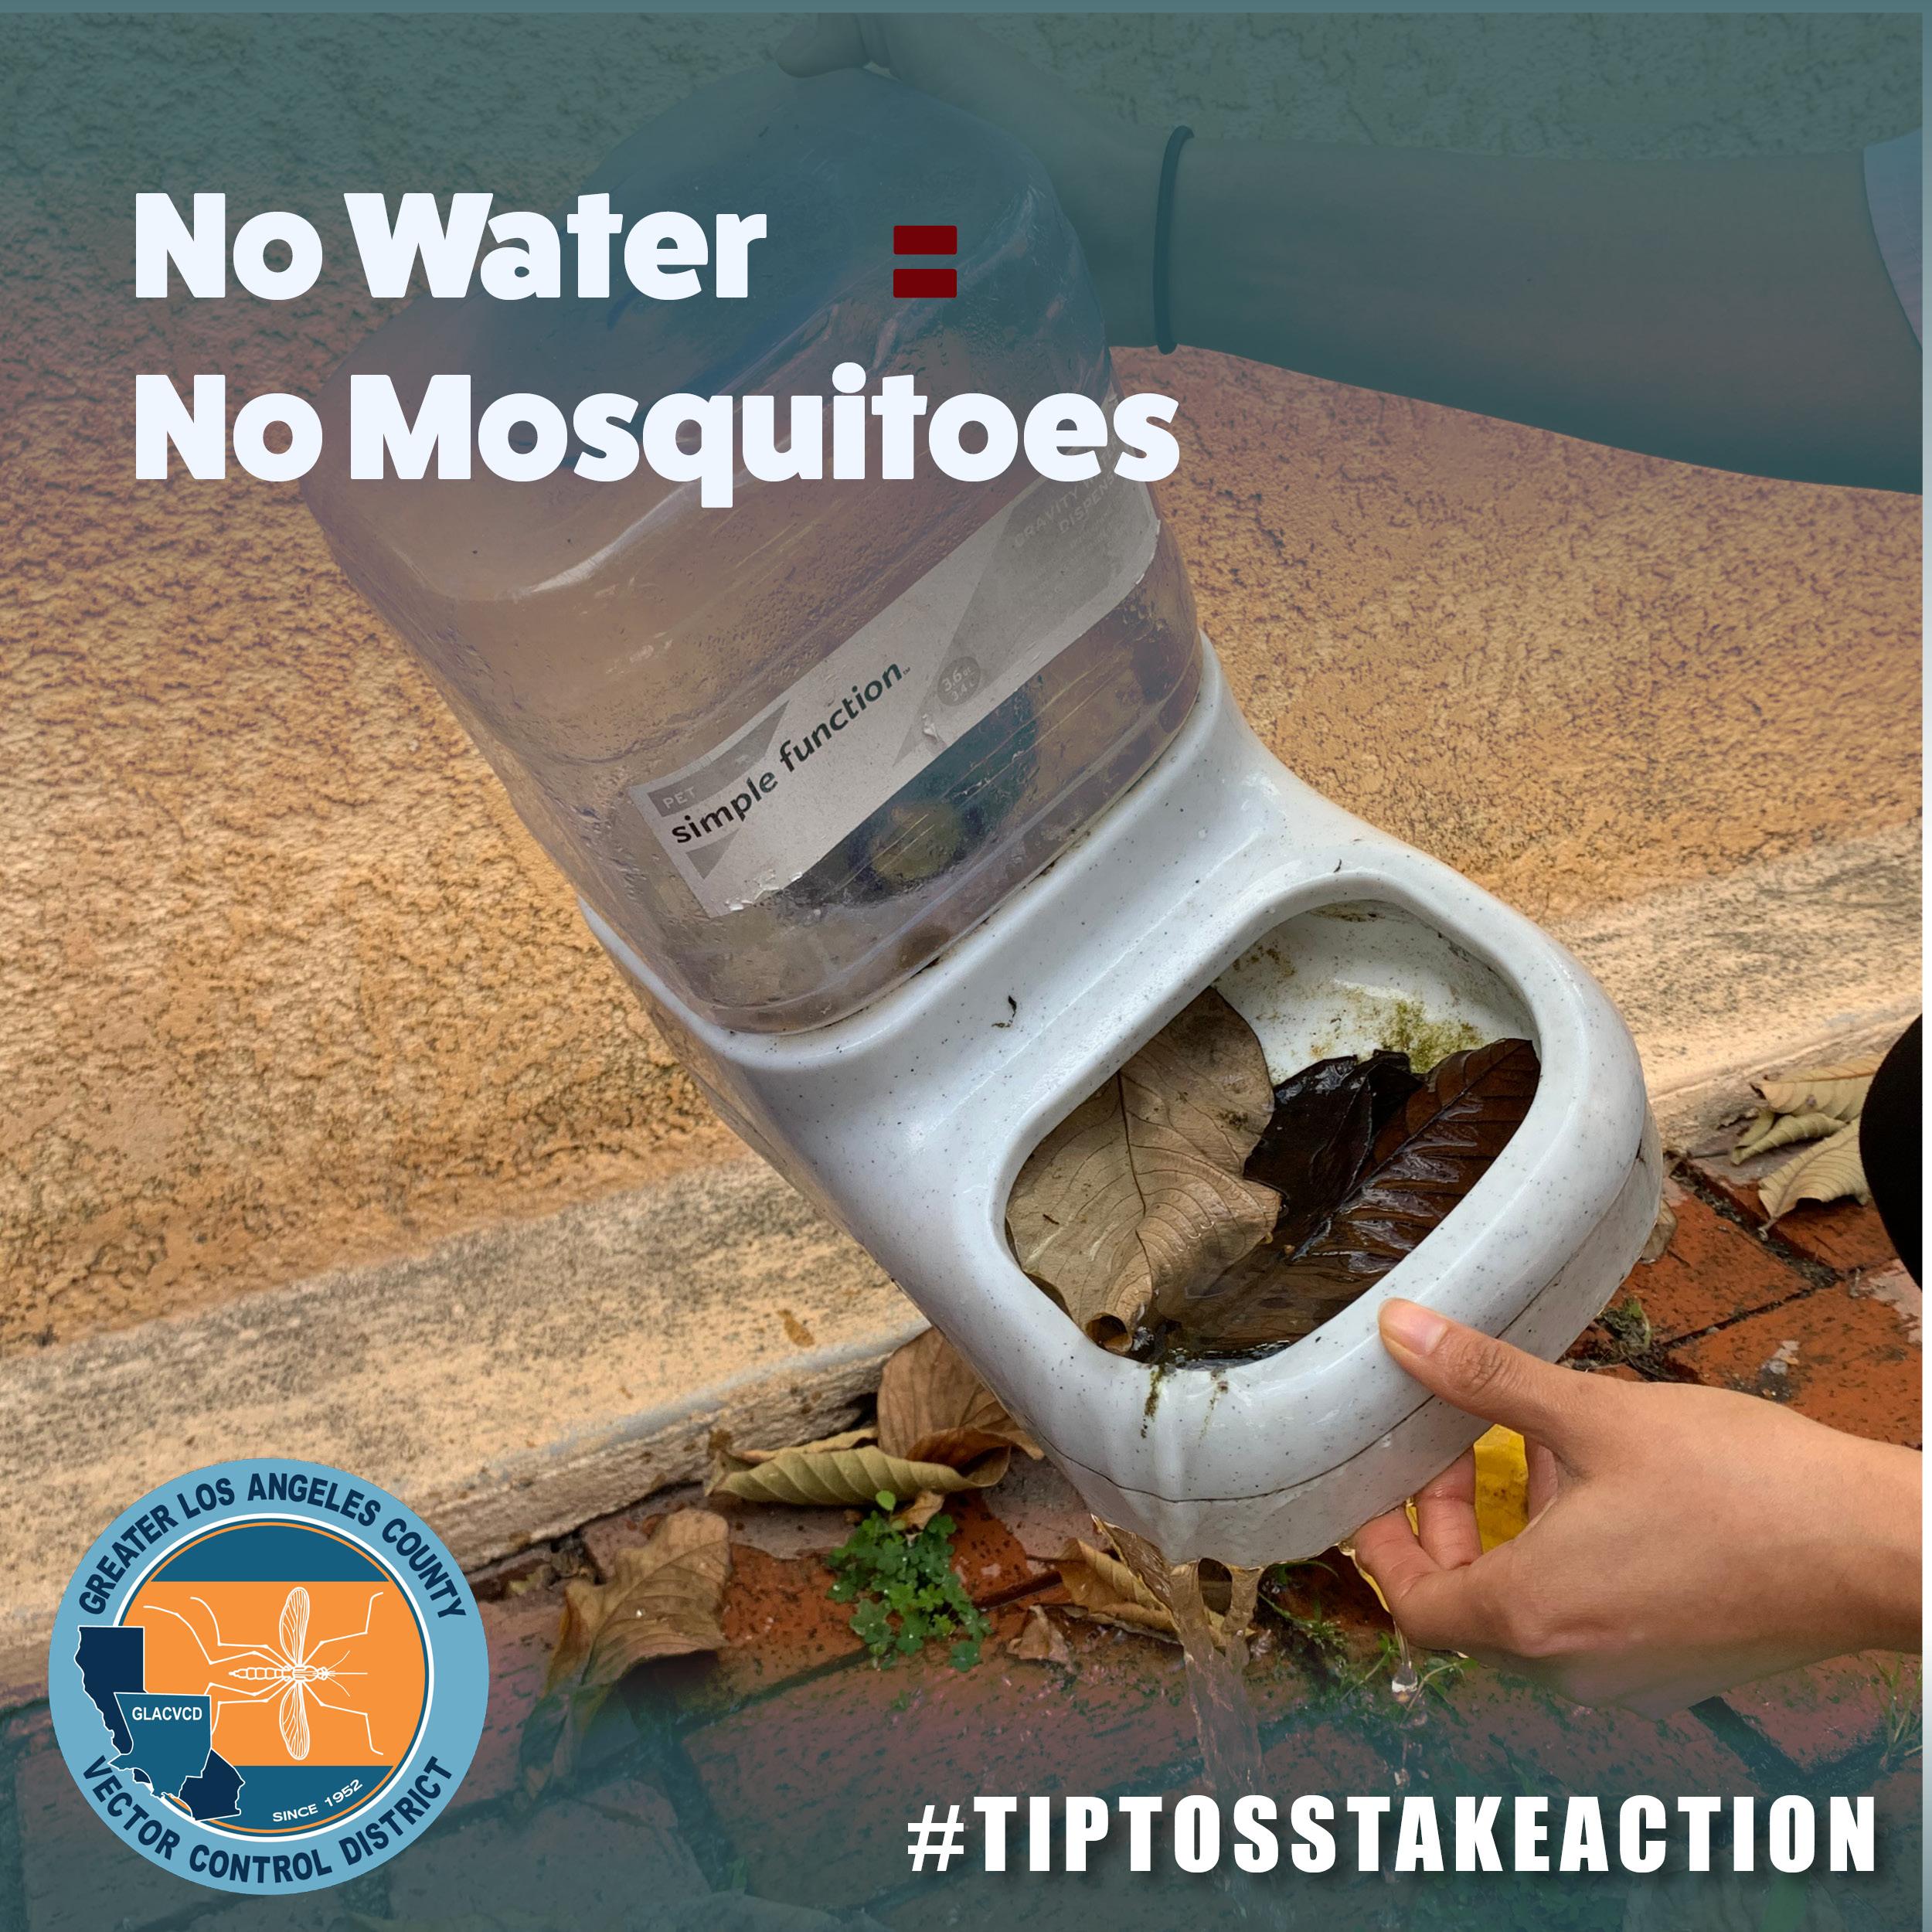 No water, no mosquitoes